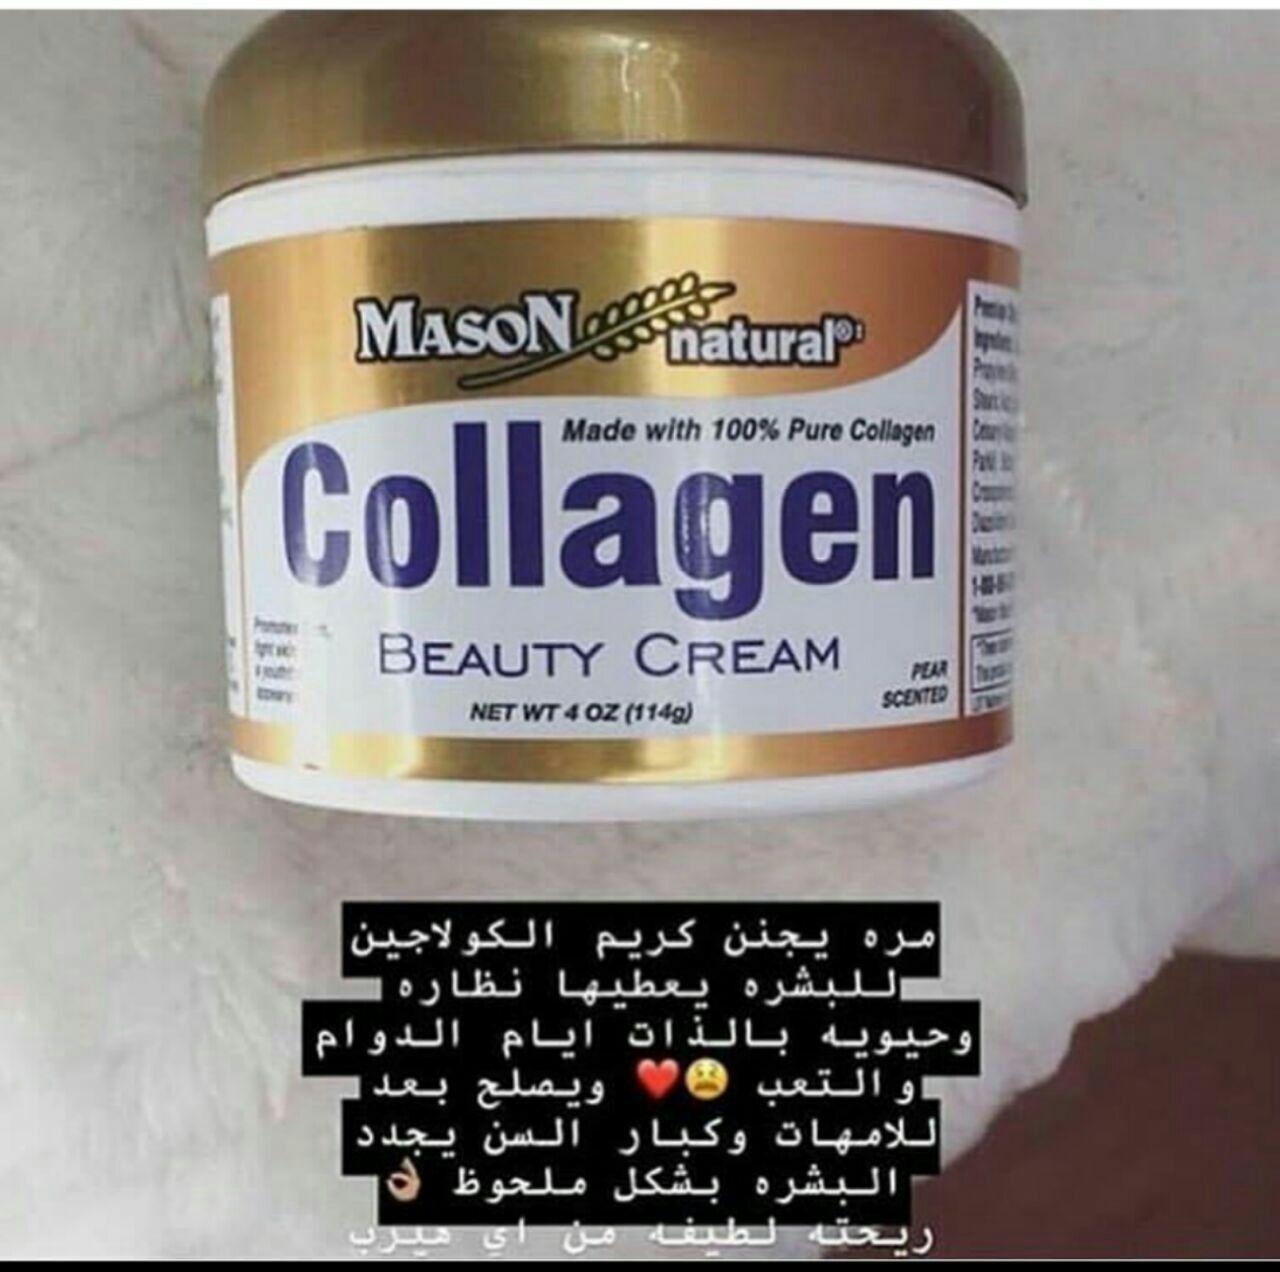 كريم الكولاجين Collagen Beauty Cream Beauty Cream Beauty Skin Care